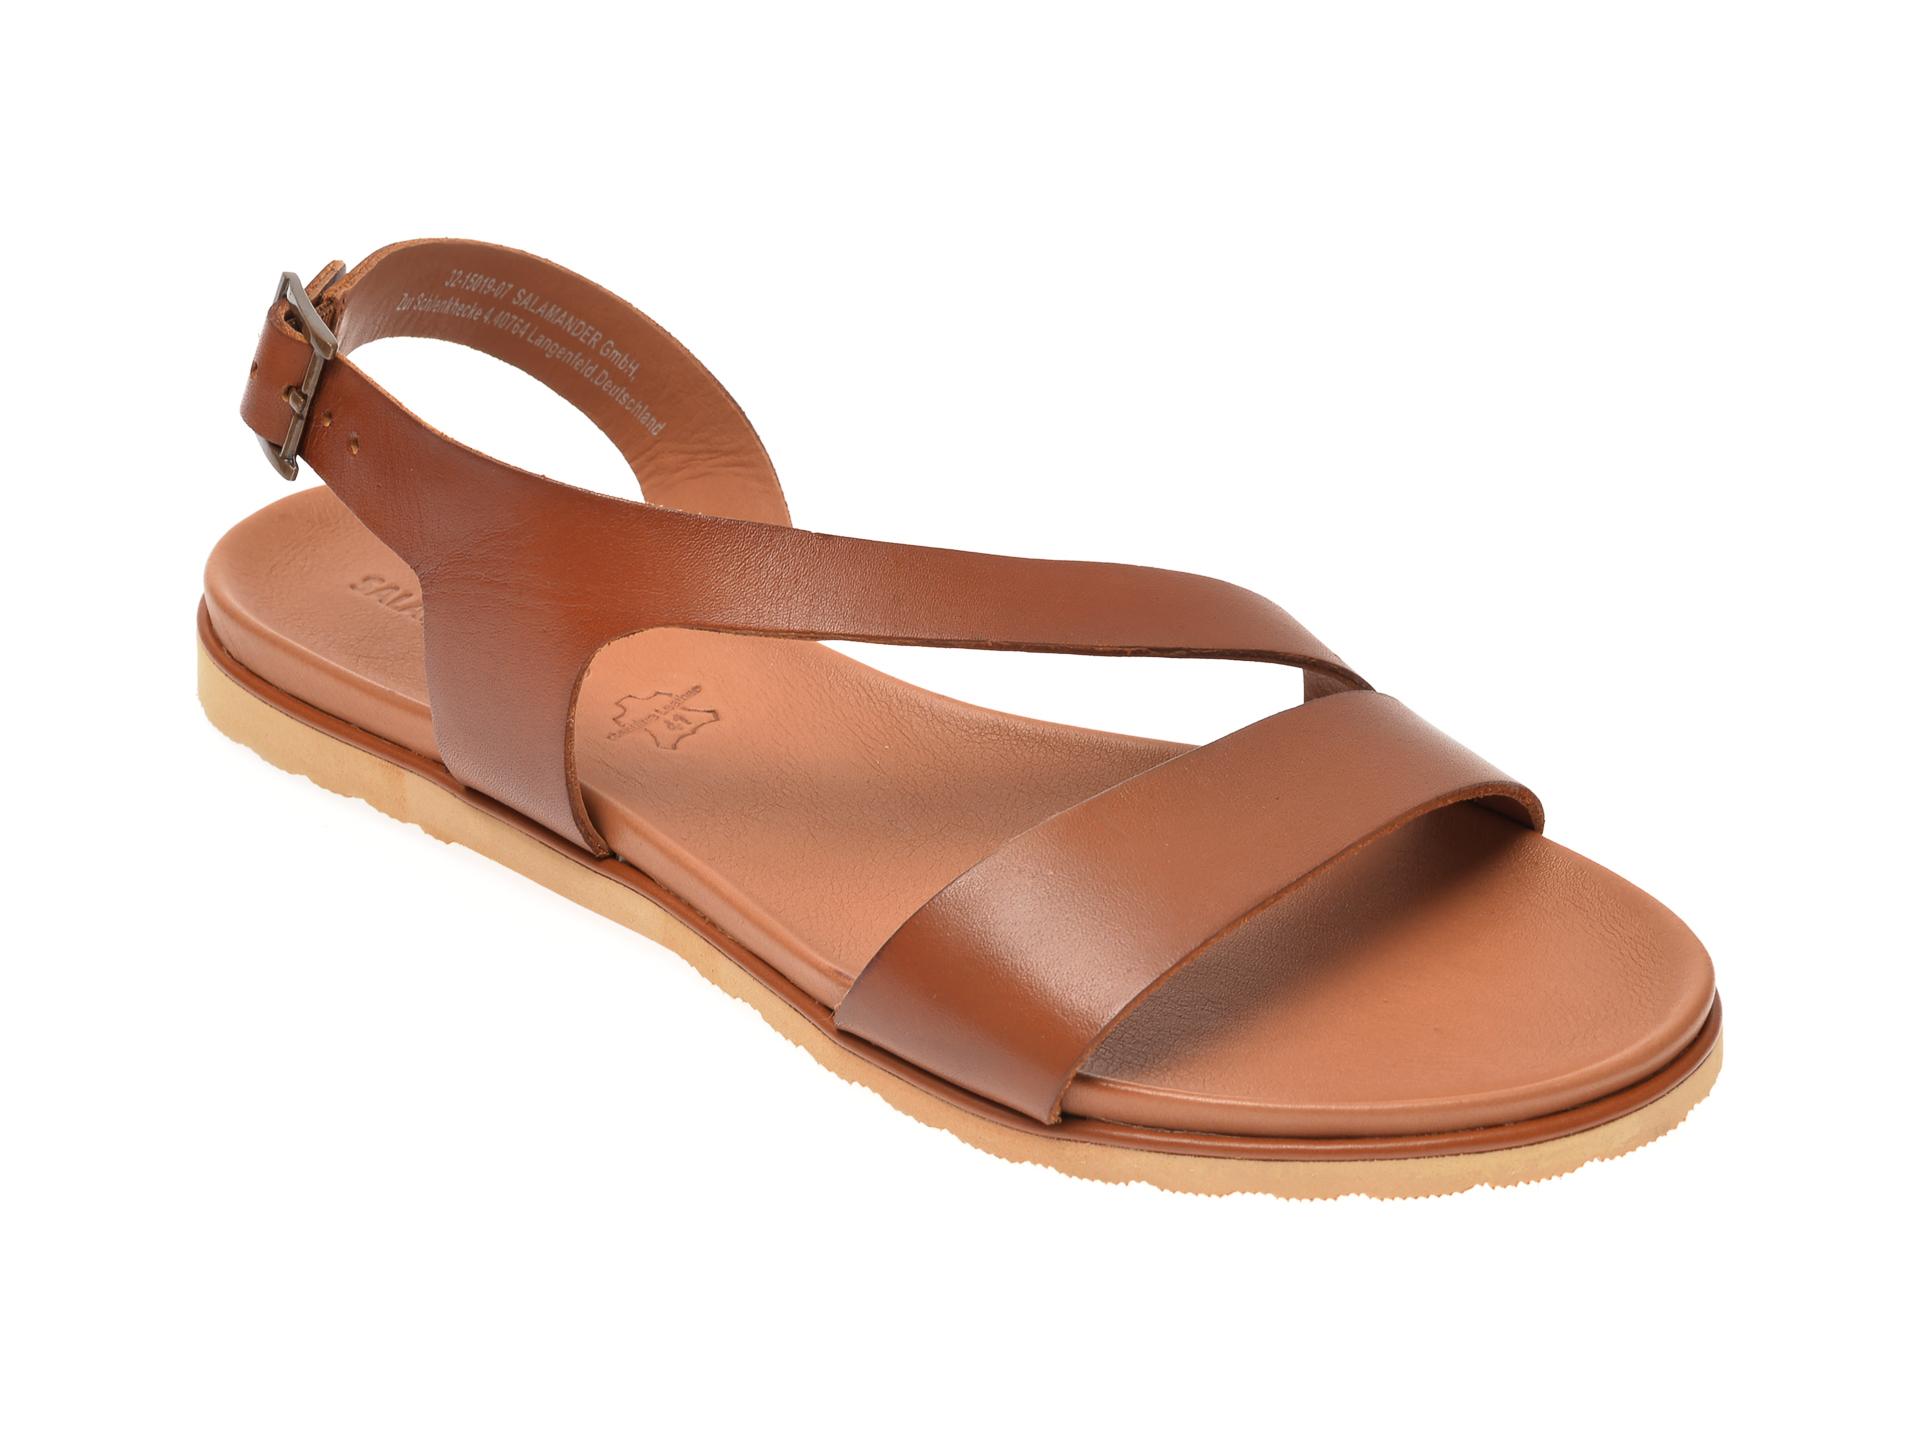 Sandale SALAMANDER coniac, 15019, din piele naturala imagine